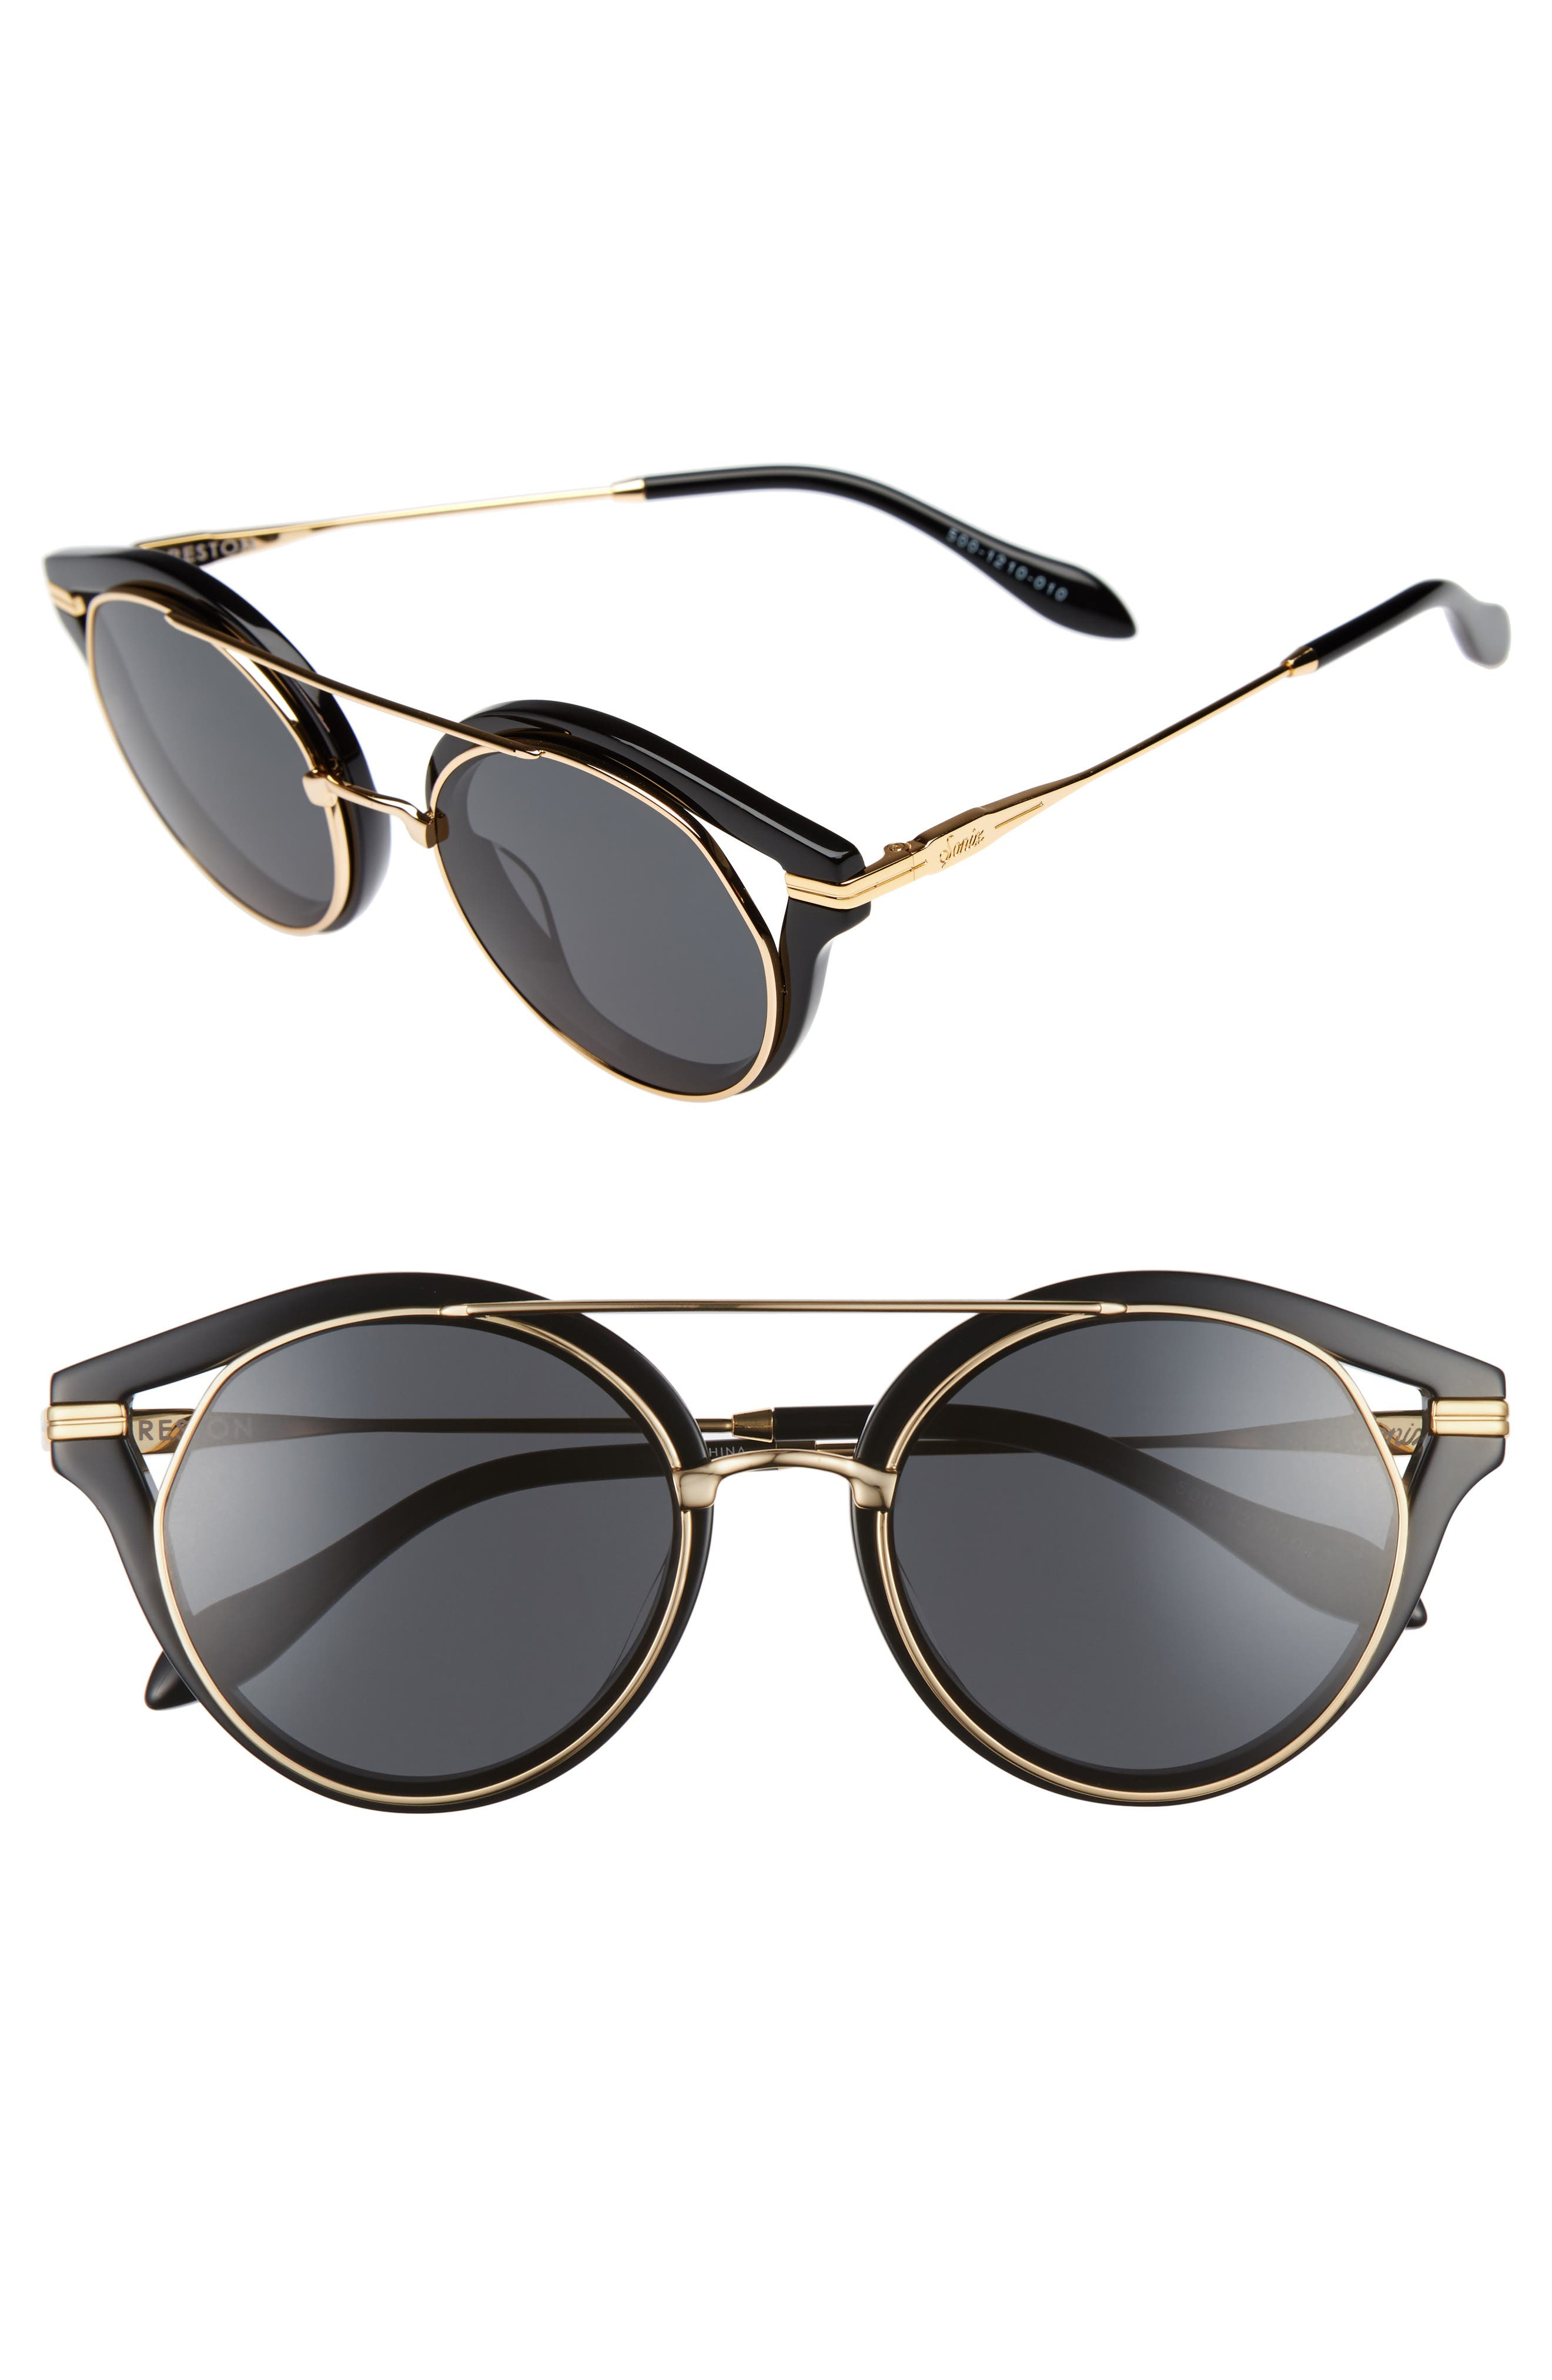 SONIX,                             Preston 51mm Gradient Round Sunglasses,                             Main thumbnail 1, color,                             001